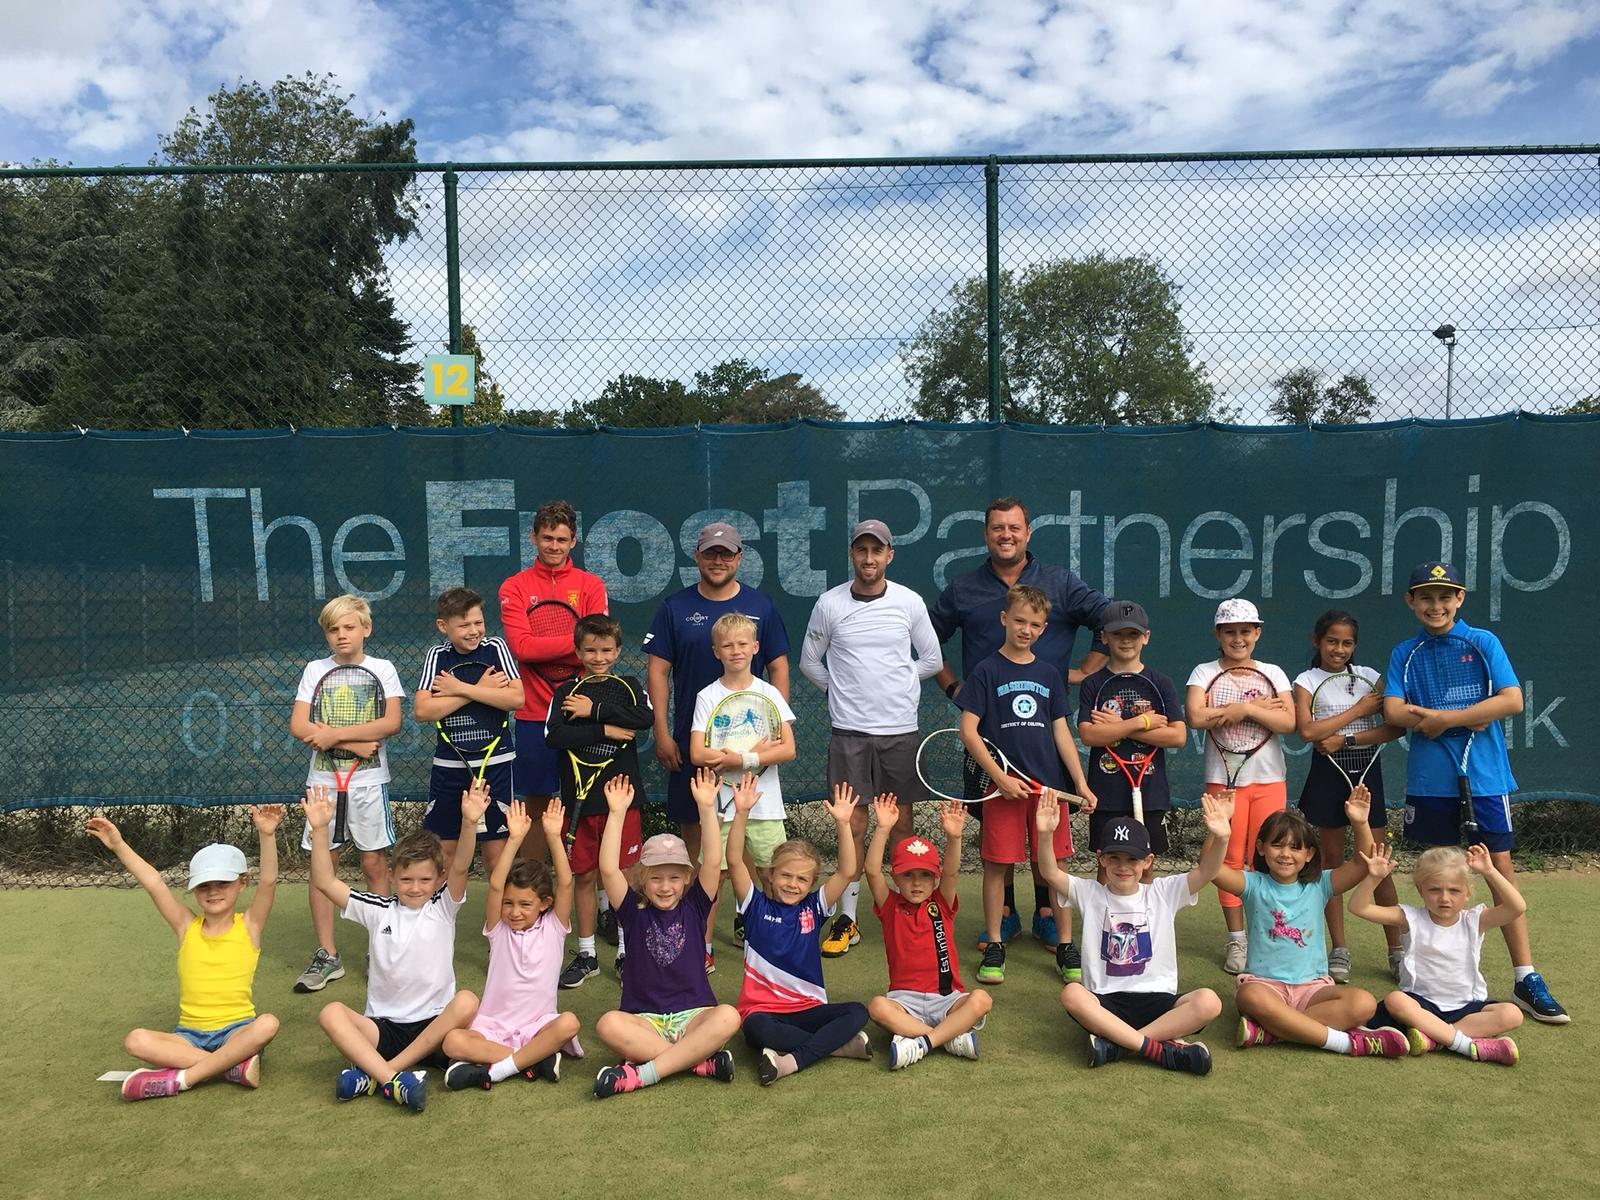 Court18 tennis coaching squad